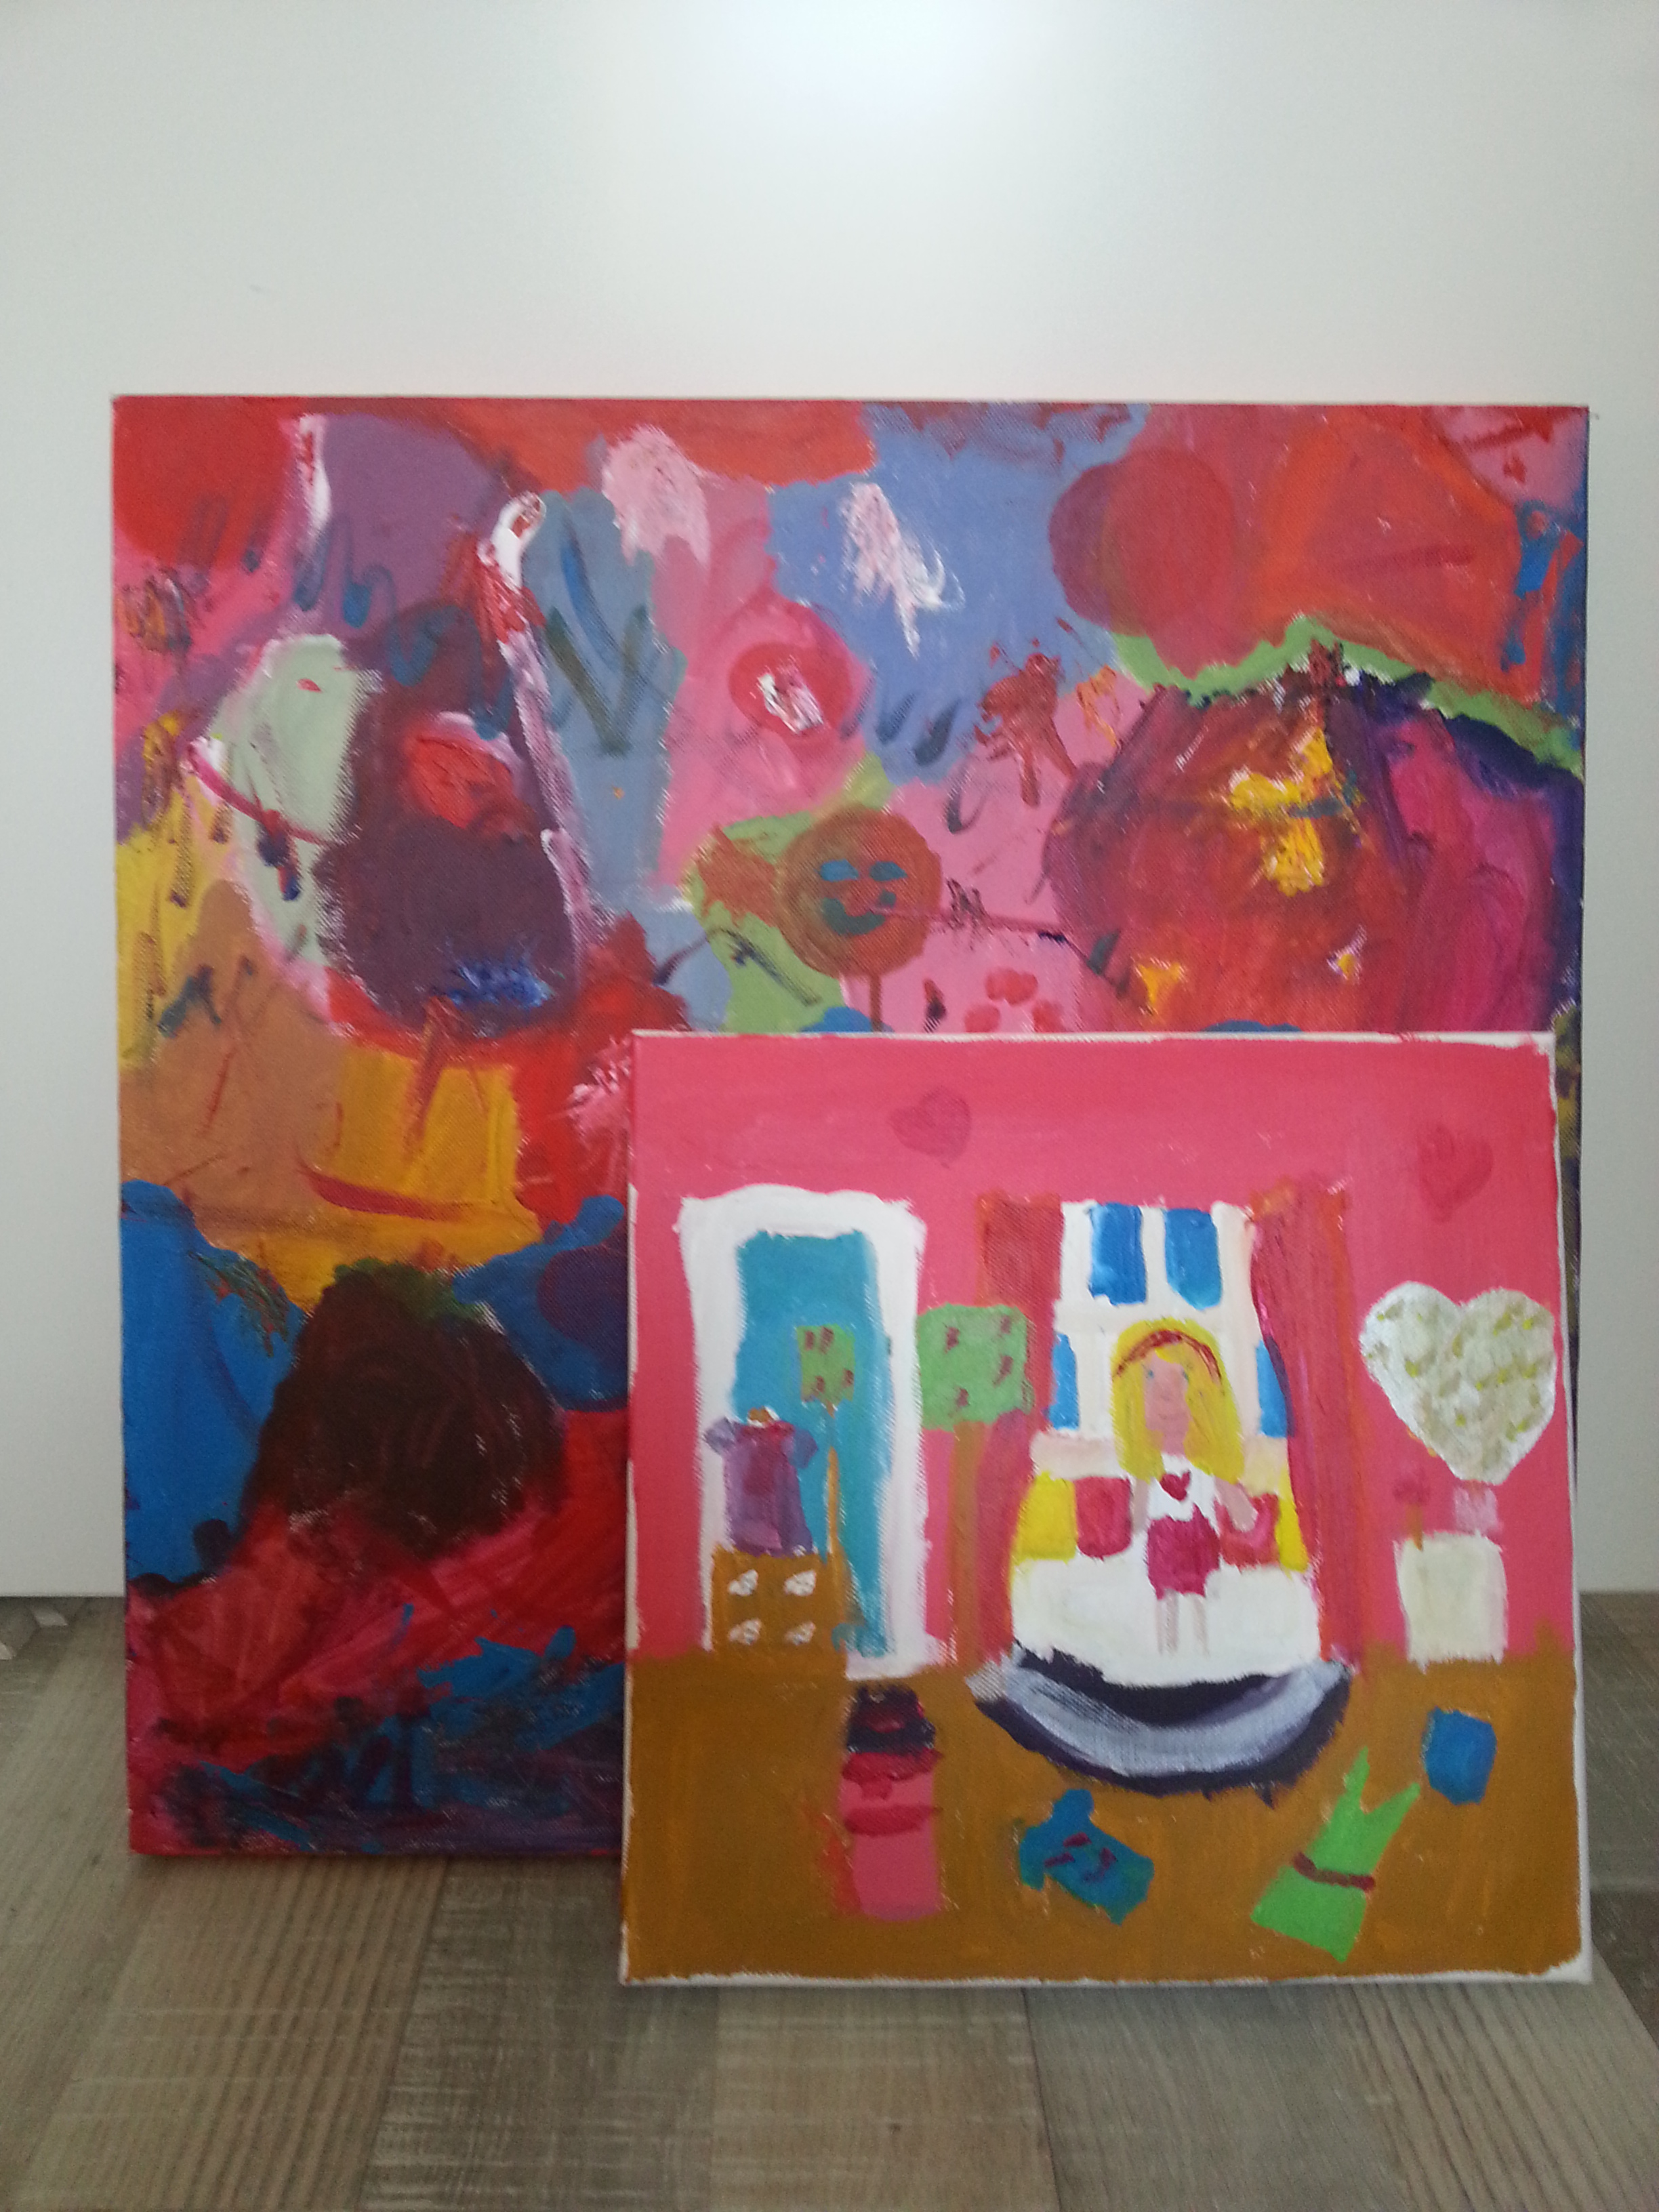 Vintage holland pagina 5 - Kleur schilderij gang ...